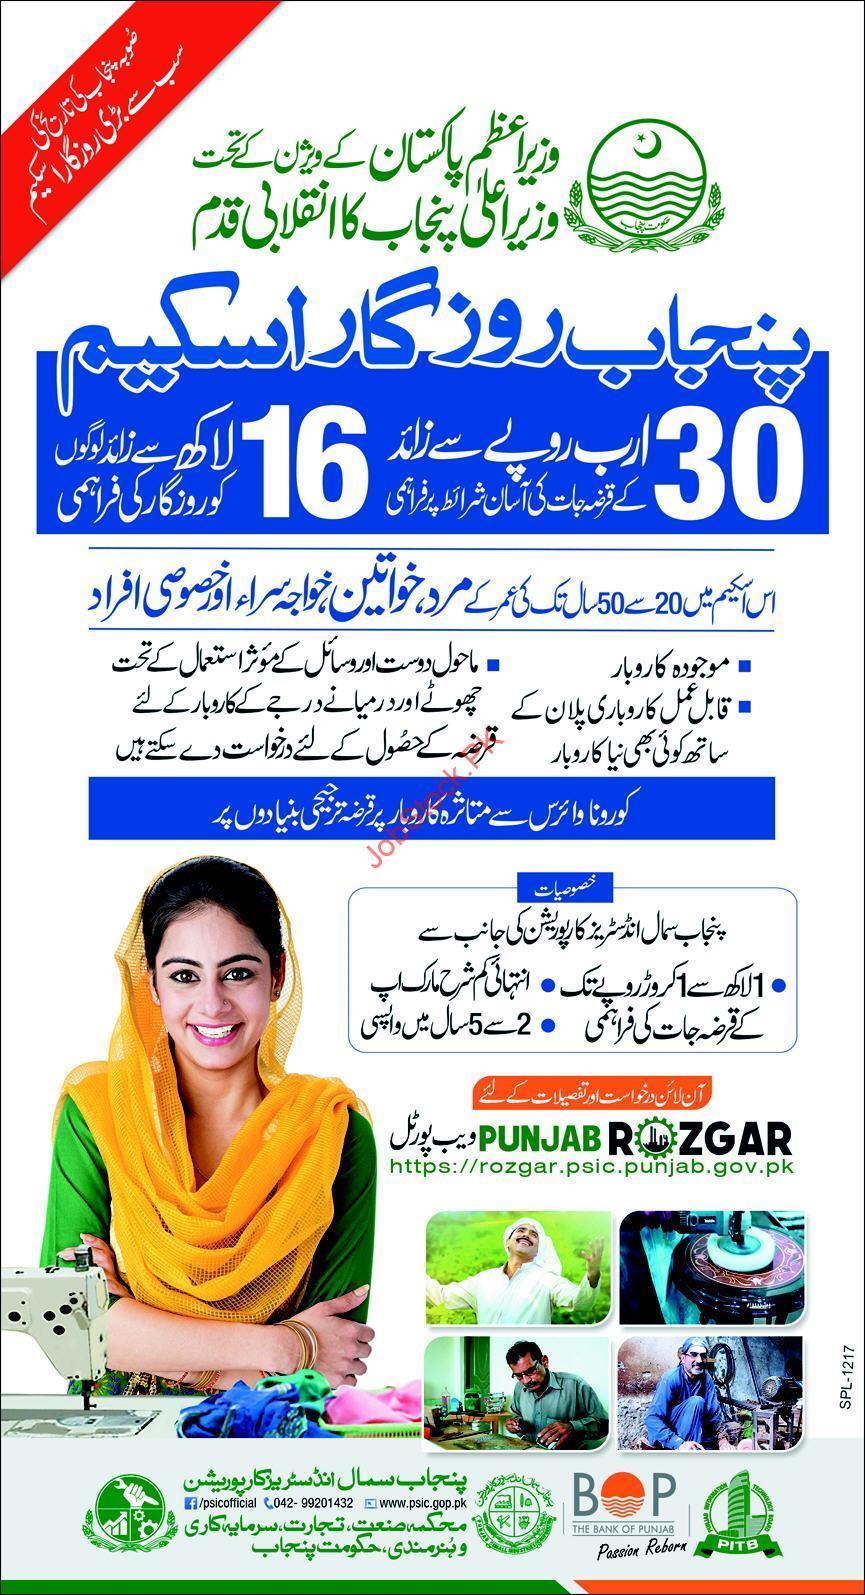 Punjab Rozgar Scheme And Punjab Rozgar Portal